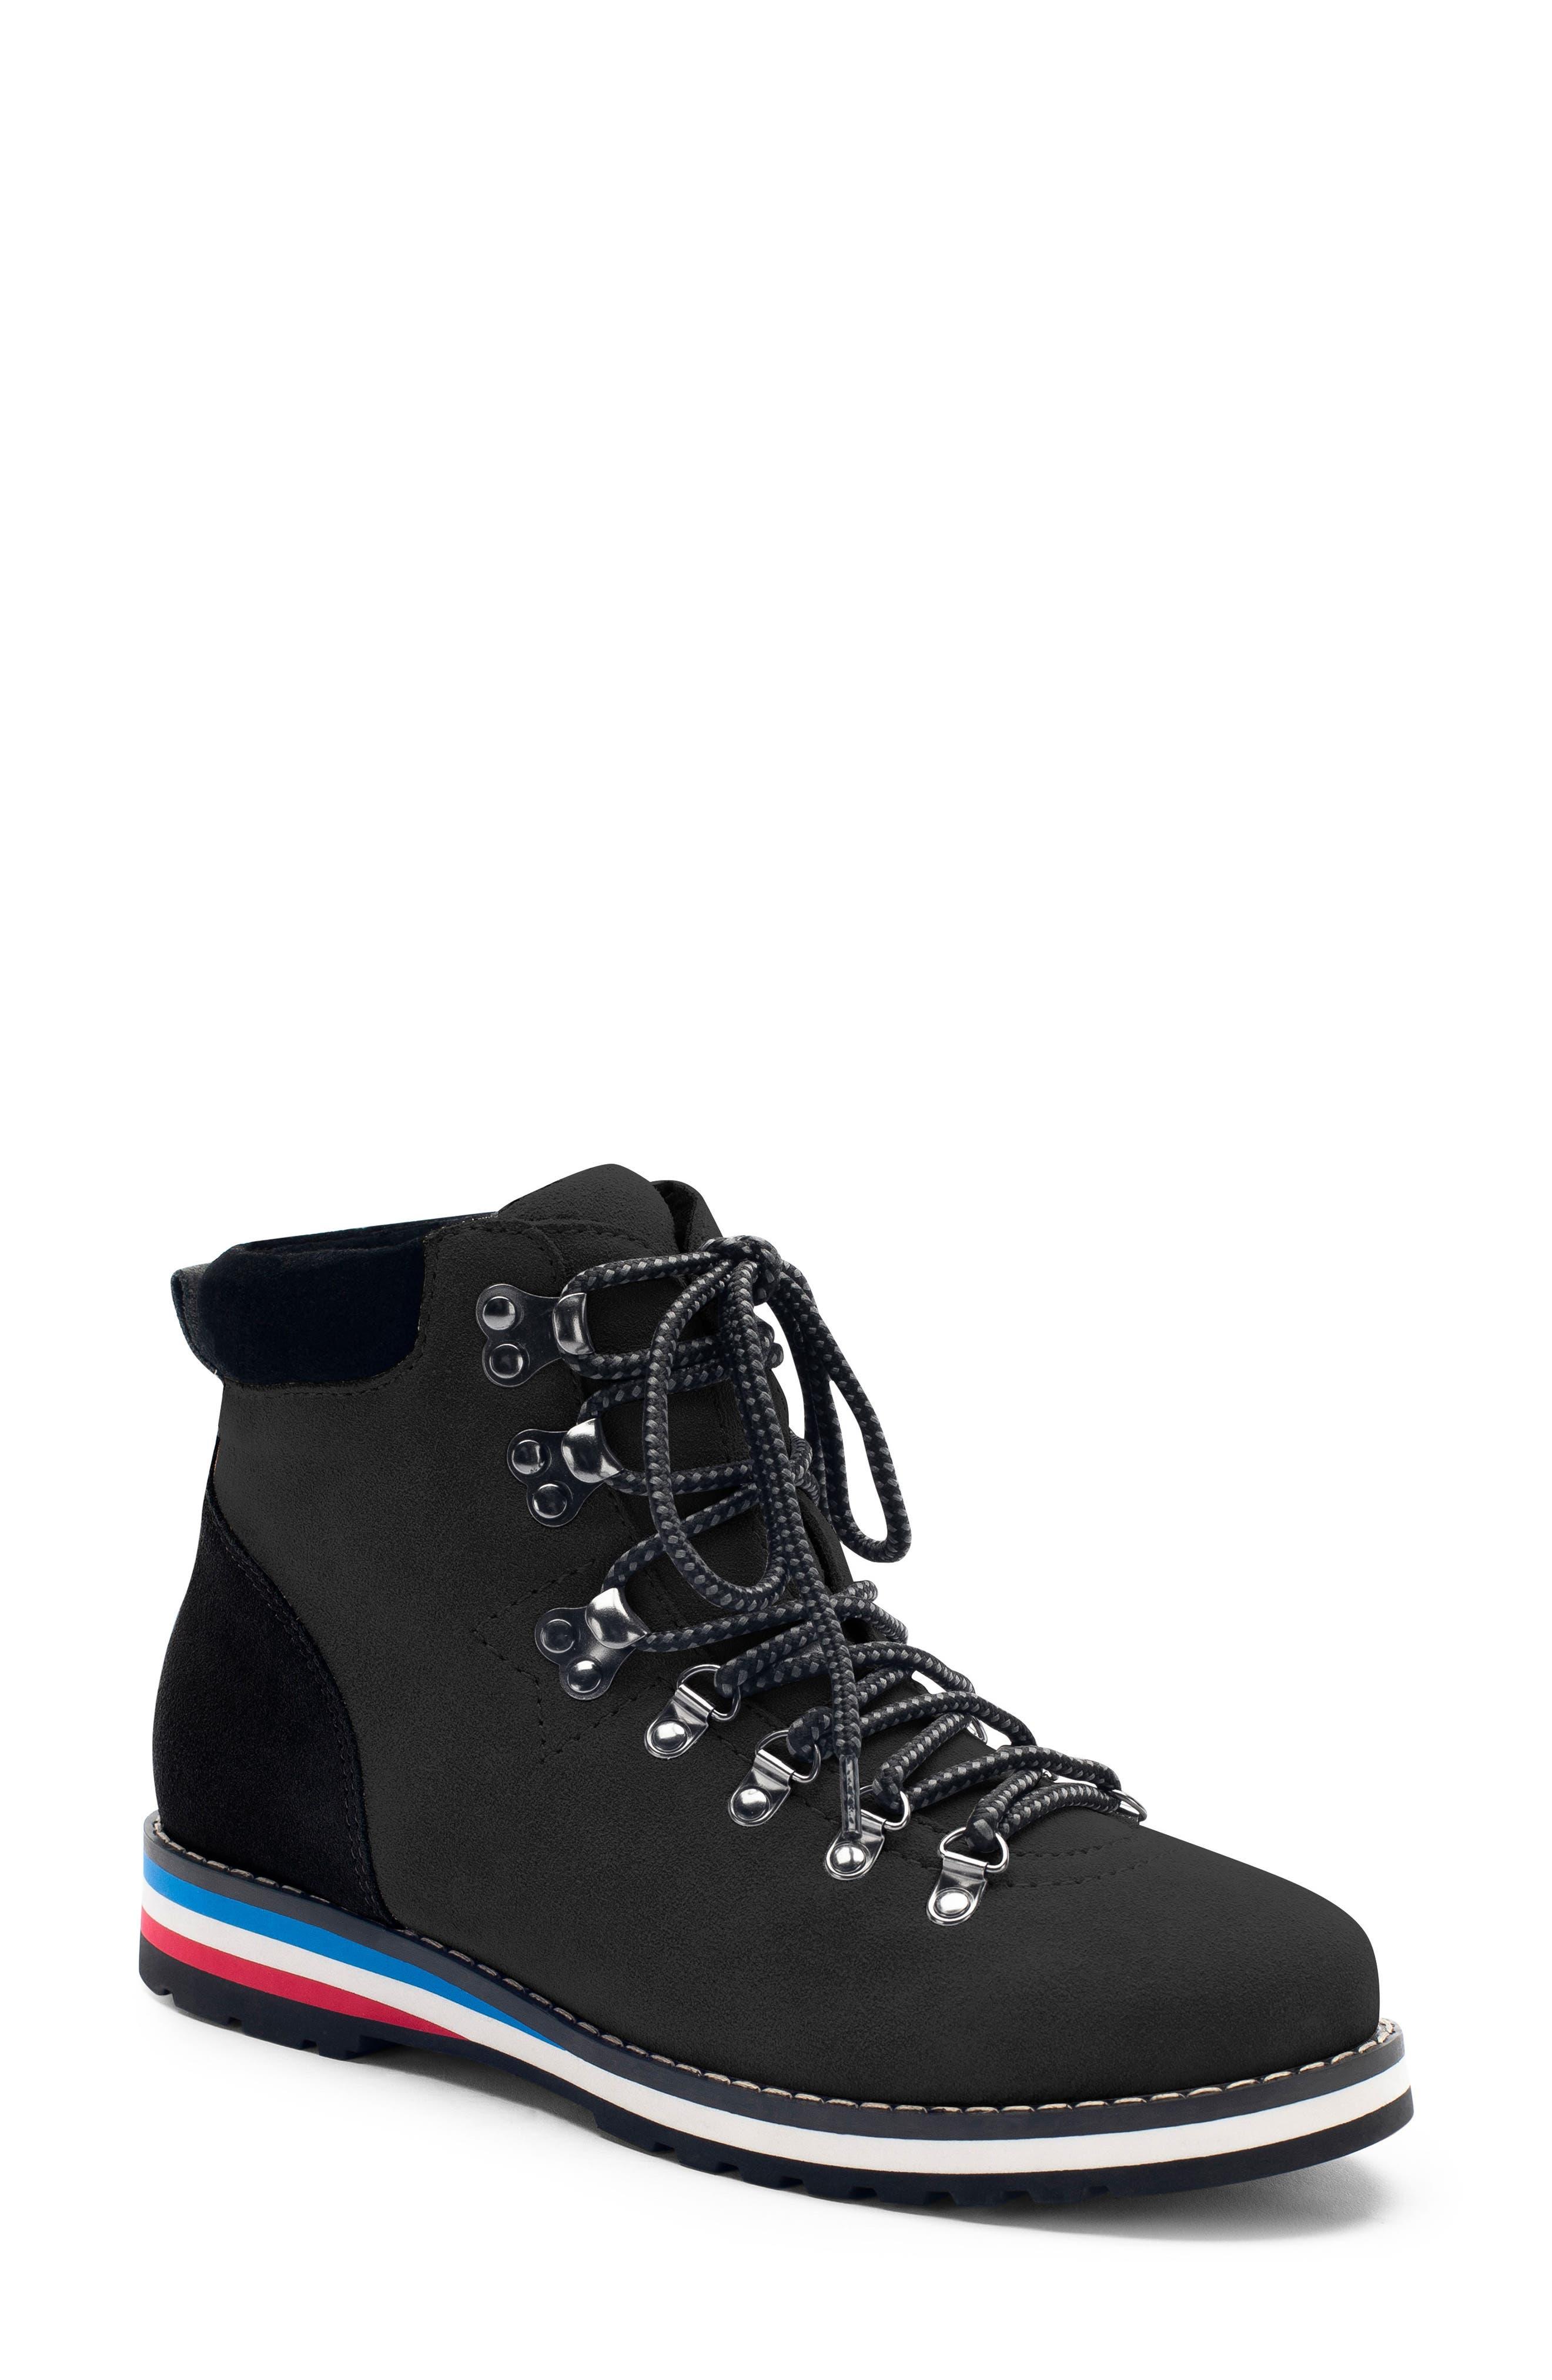 Blondo Regan Waterproof Boot- Grey